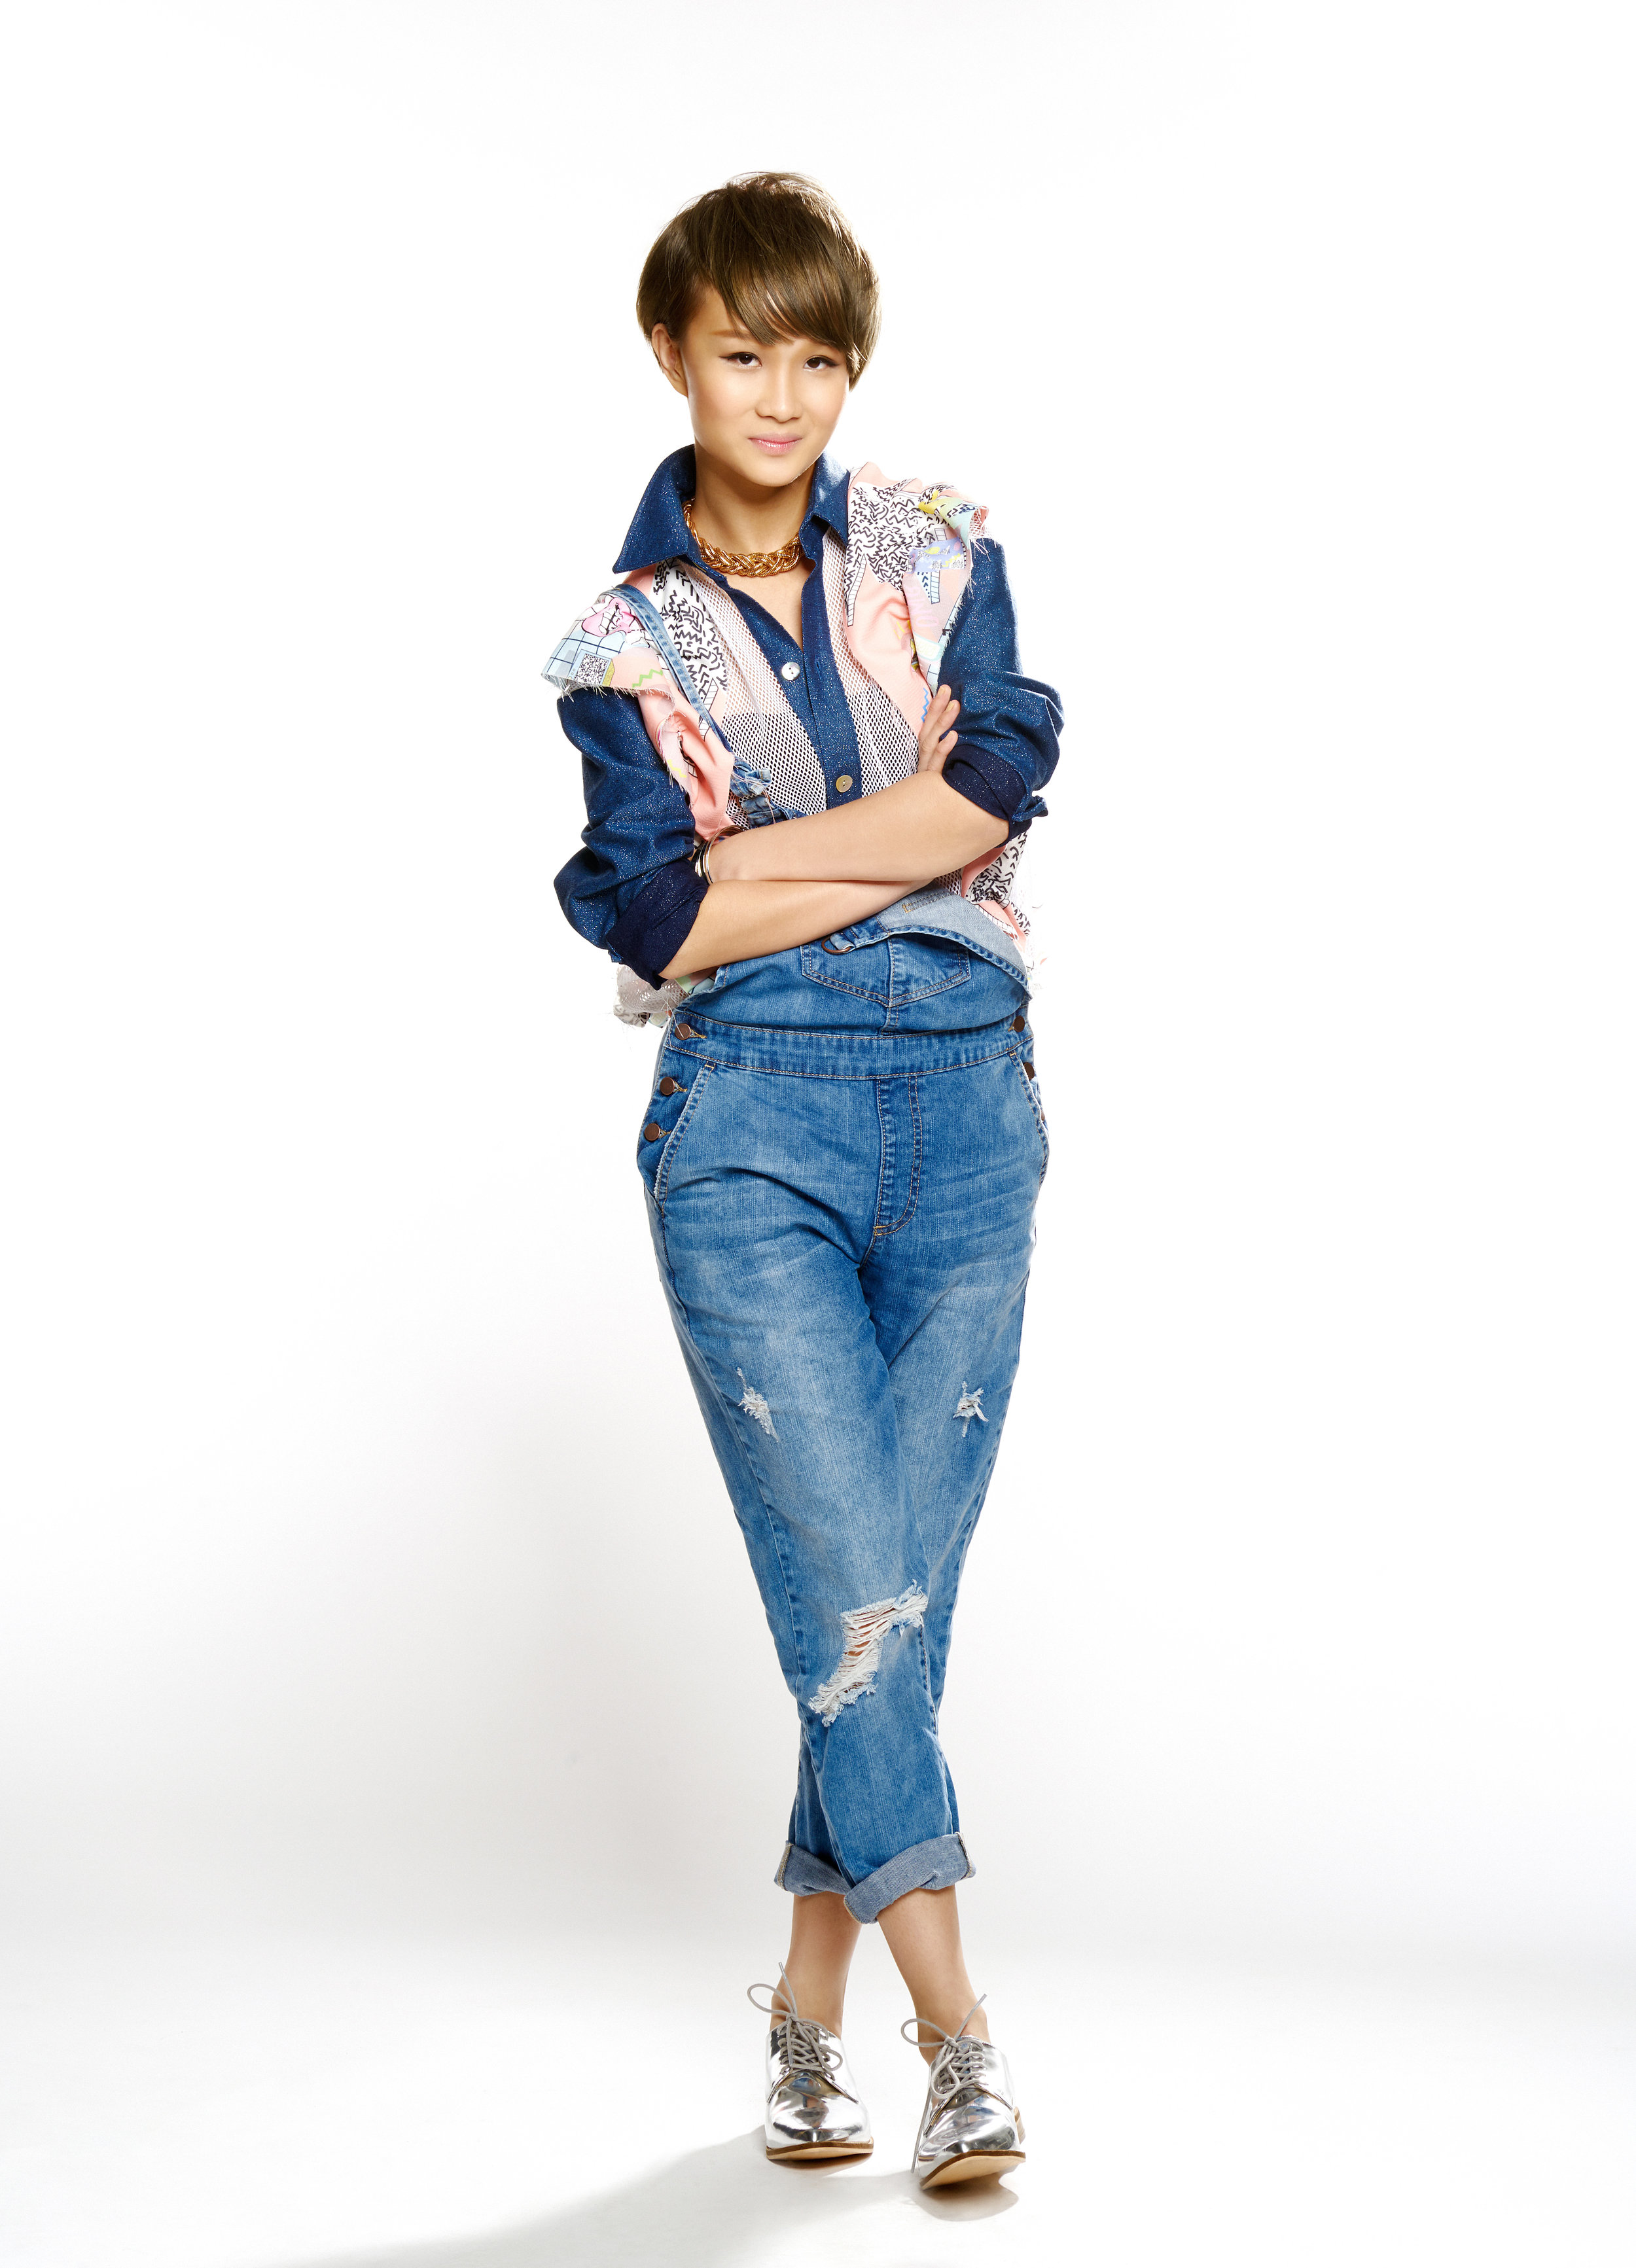 Becka_Profile.jpg